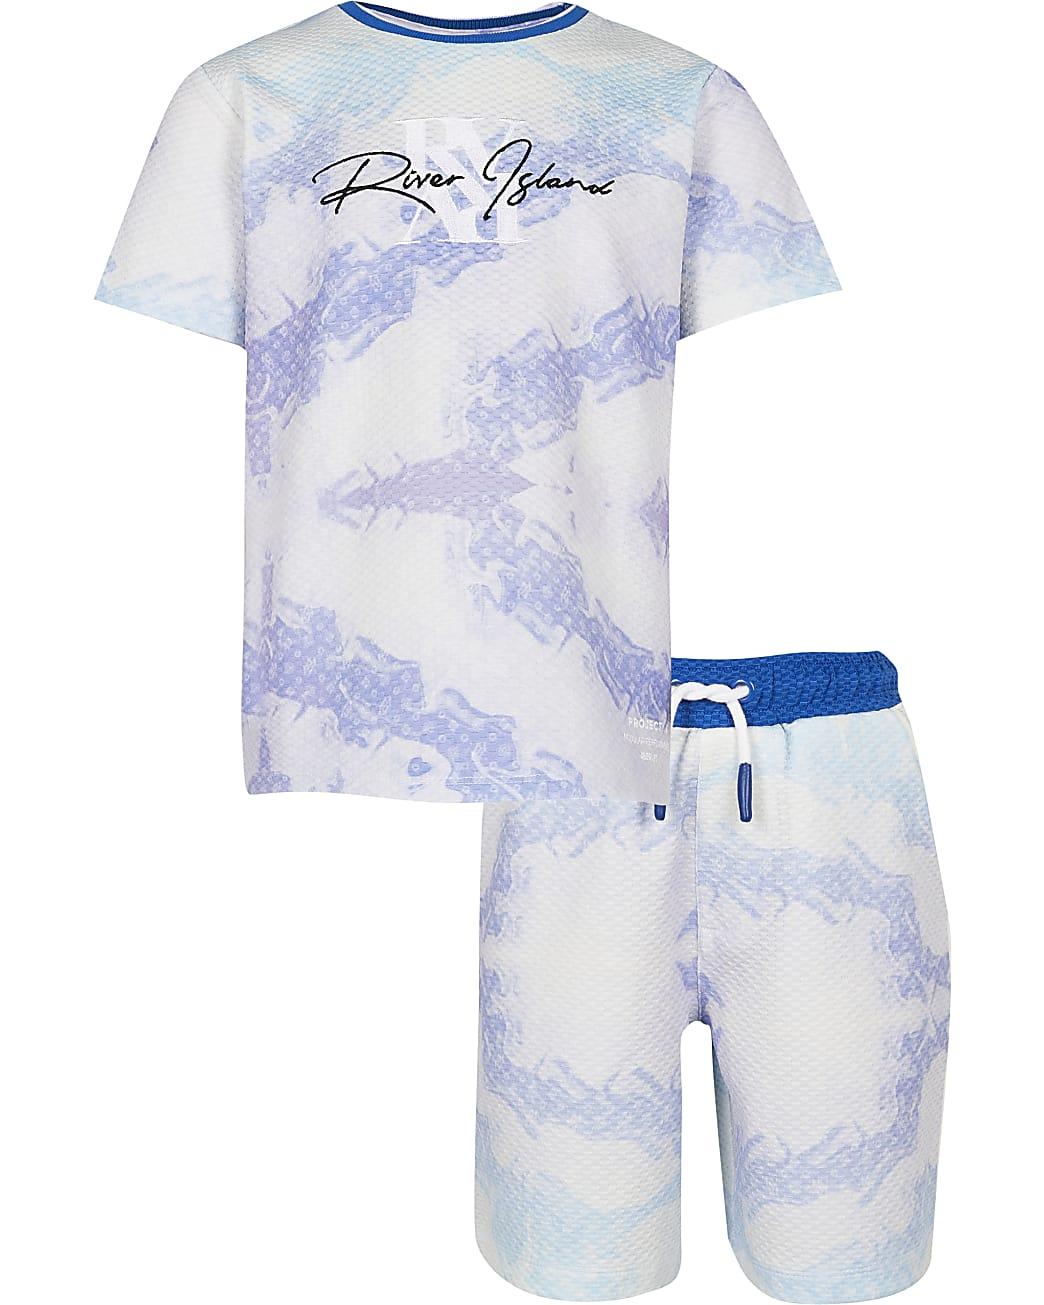 Age 13+ boys blue RI t-shirt and shorts set